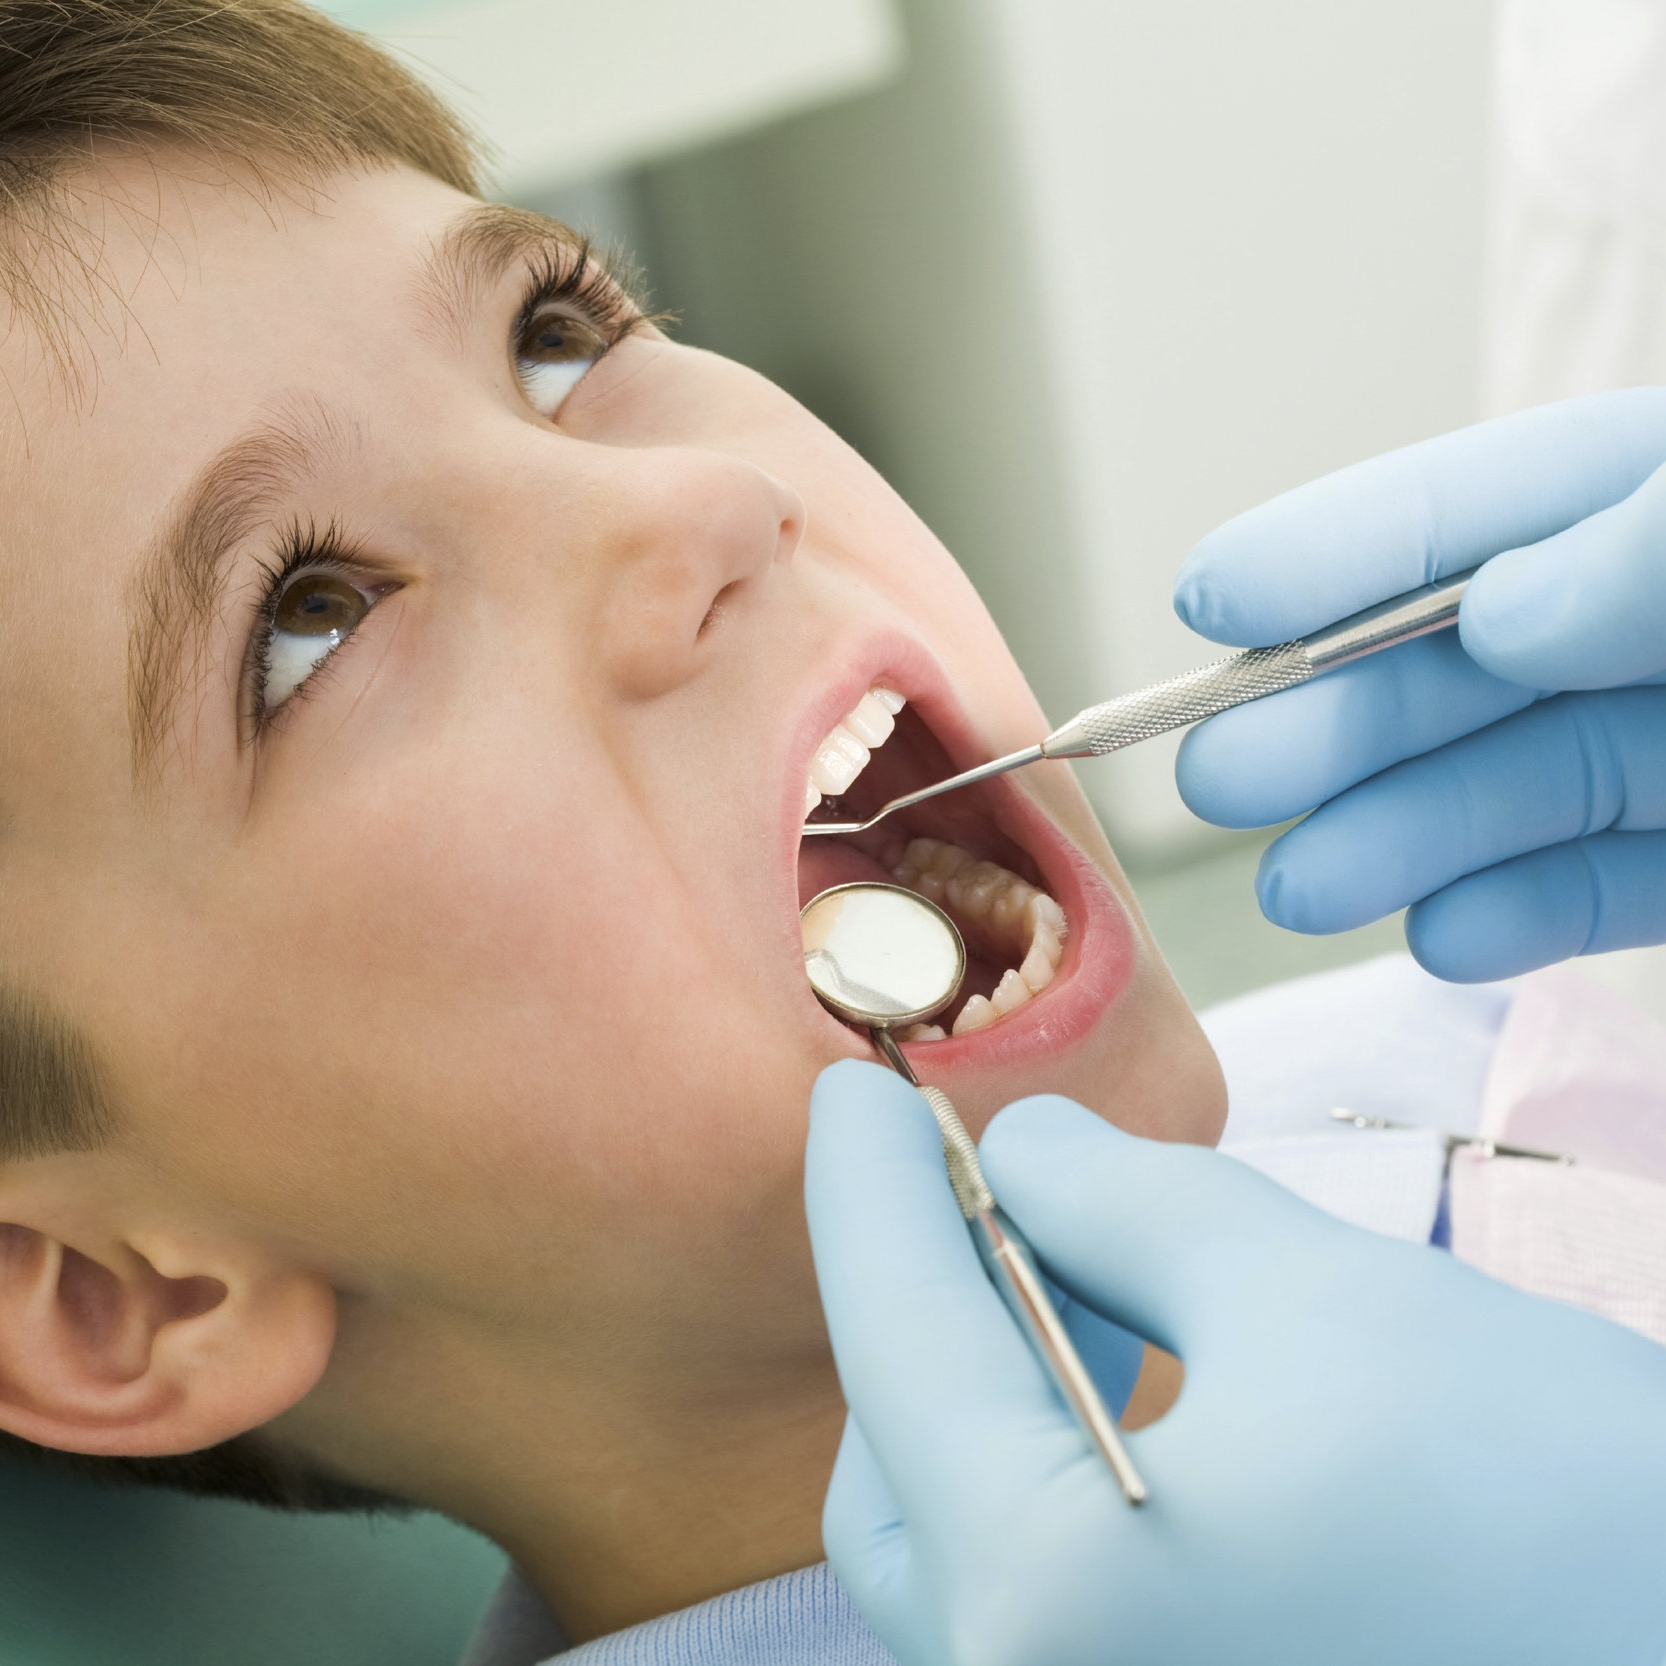 Pediatric-Dentist-1.jpg